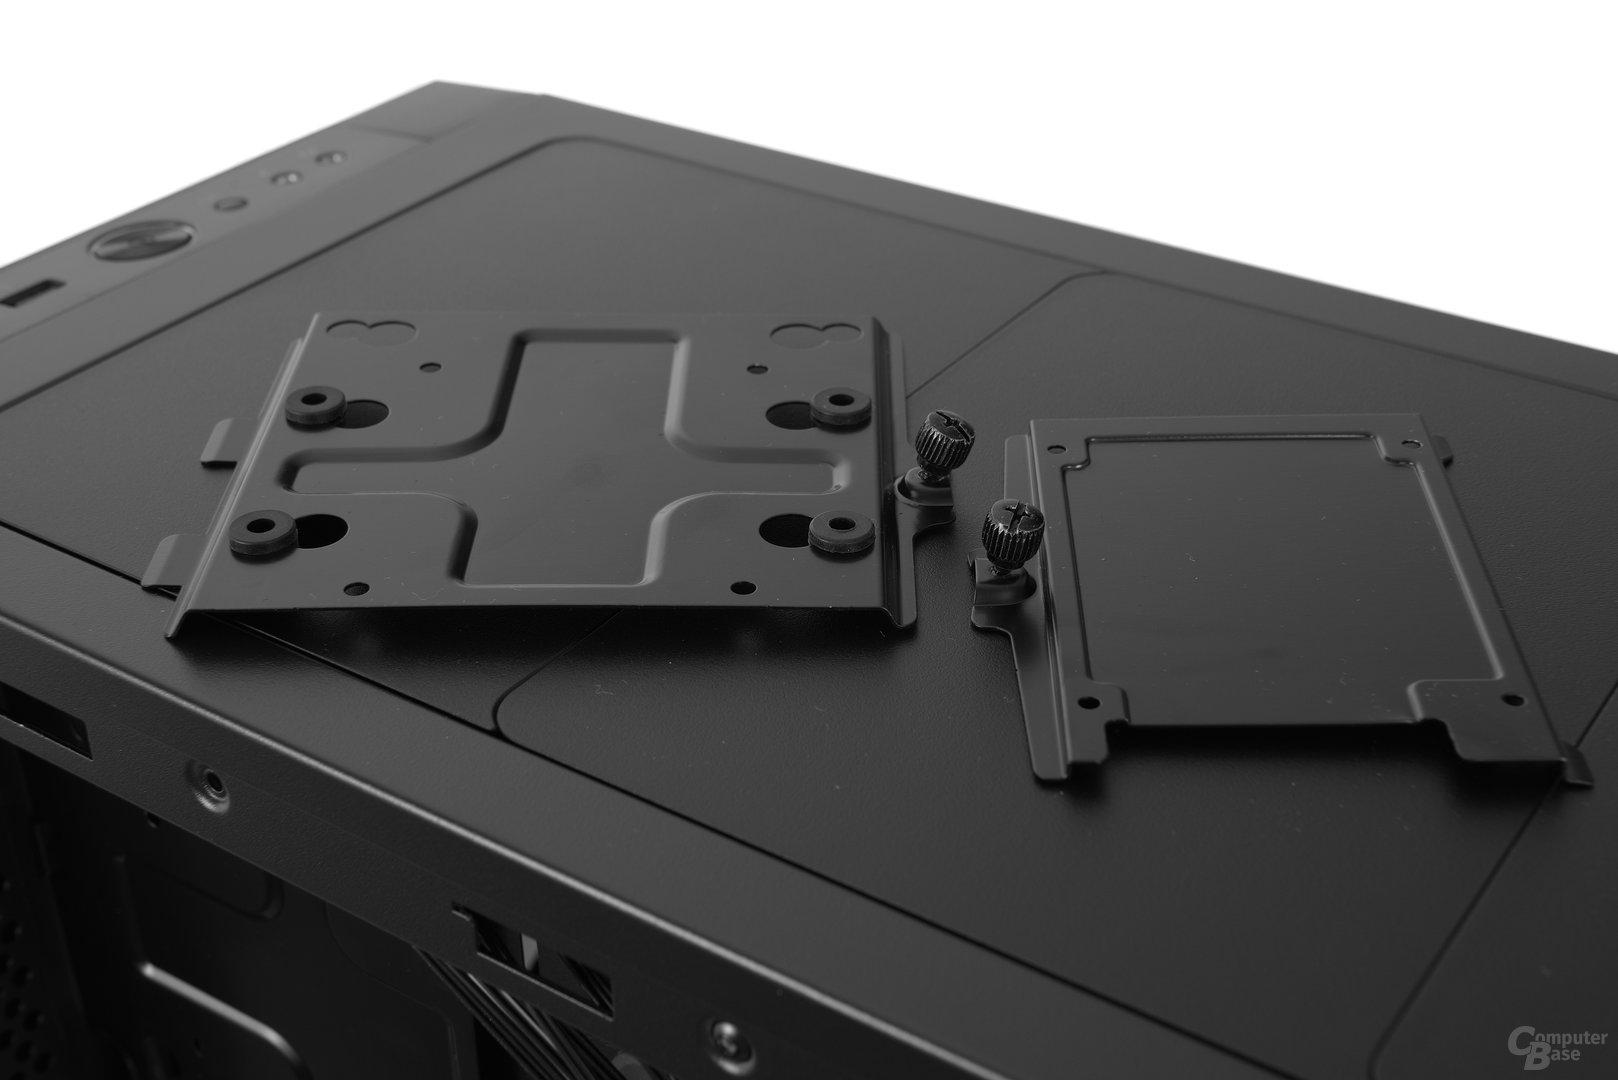 Fractal Design Define S – Festplattenbrackets im Detail